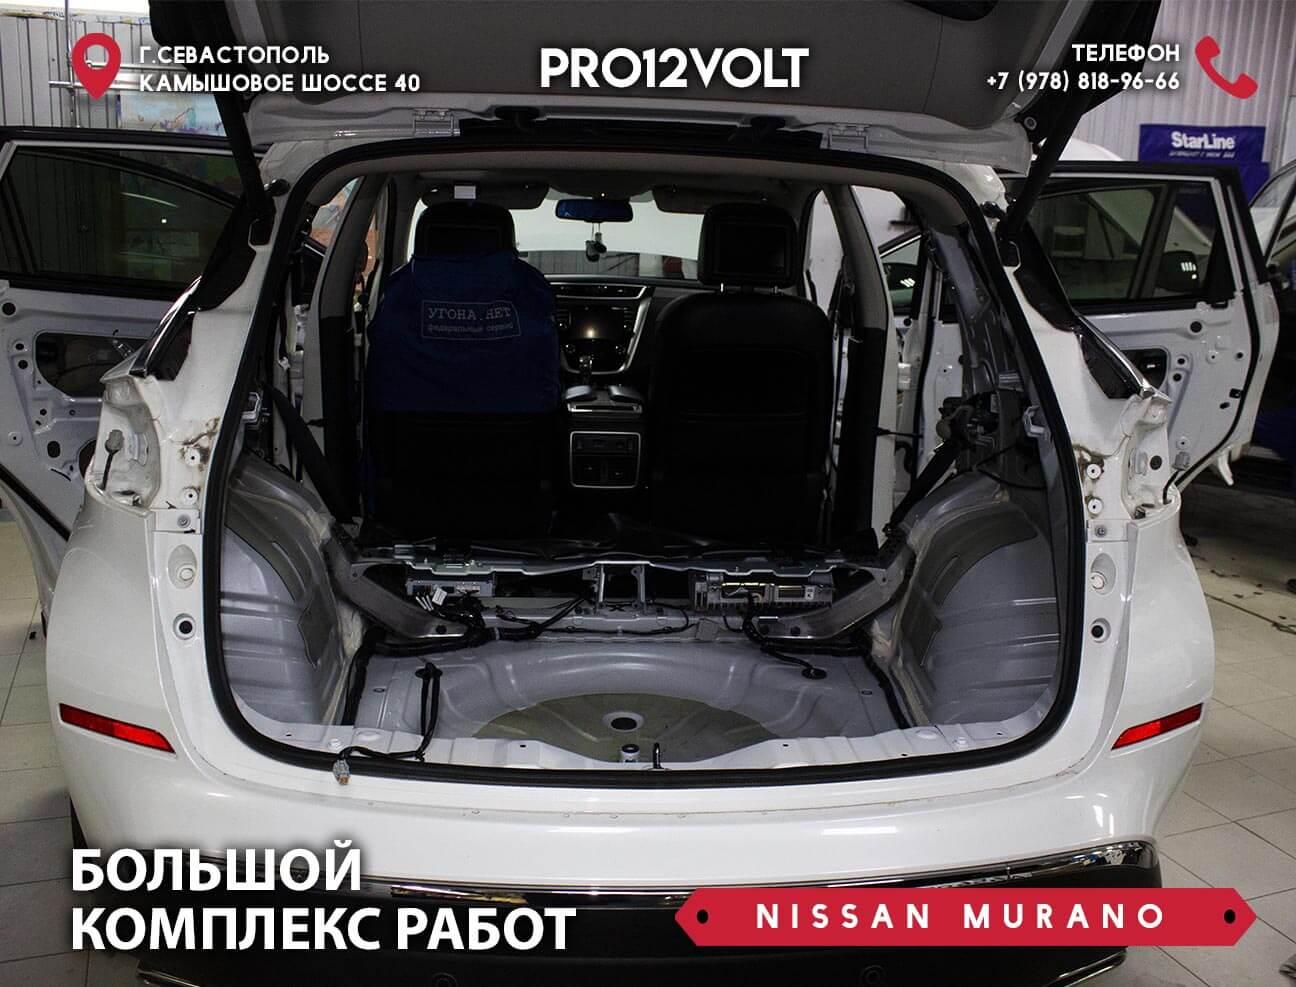 Nissan Murano, большой комплекс работ